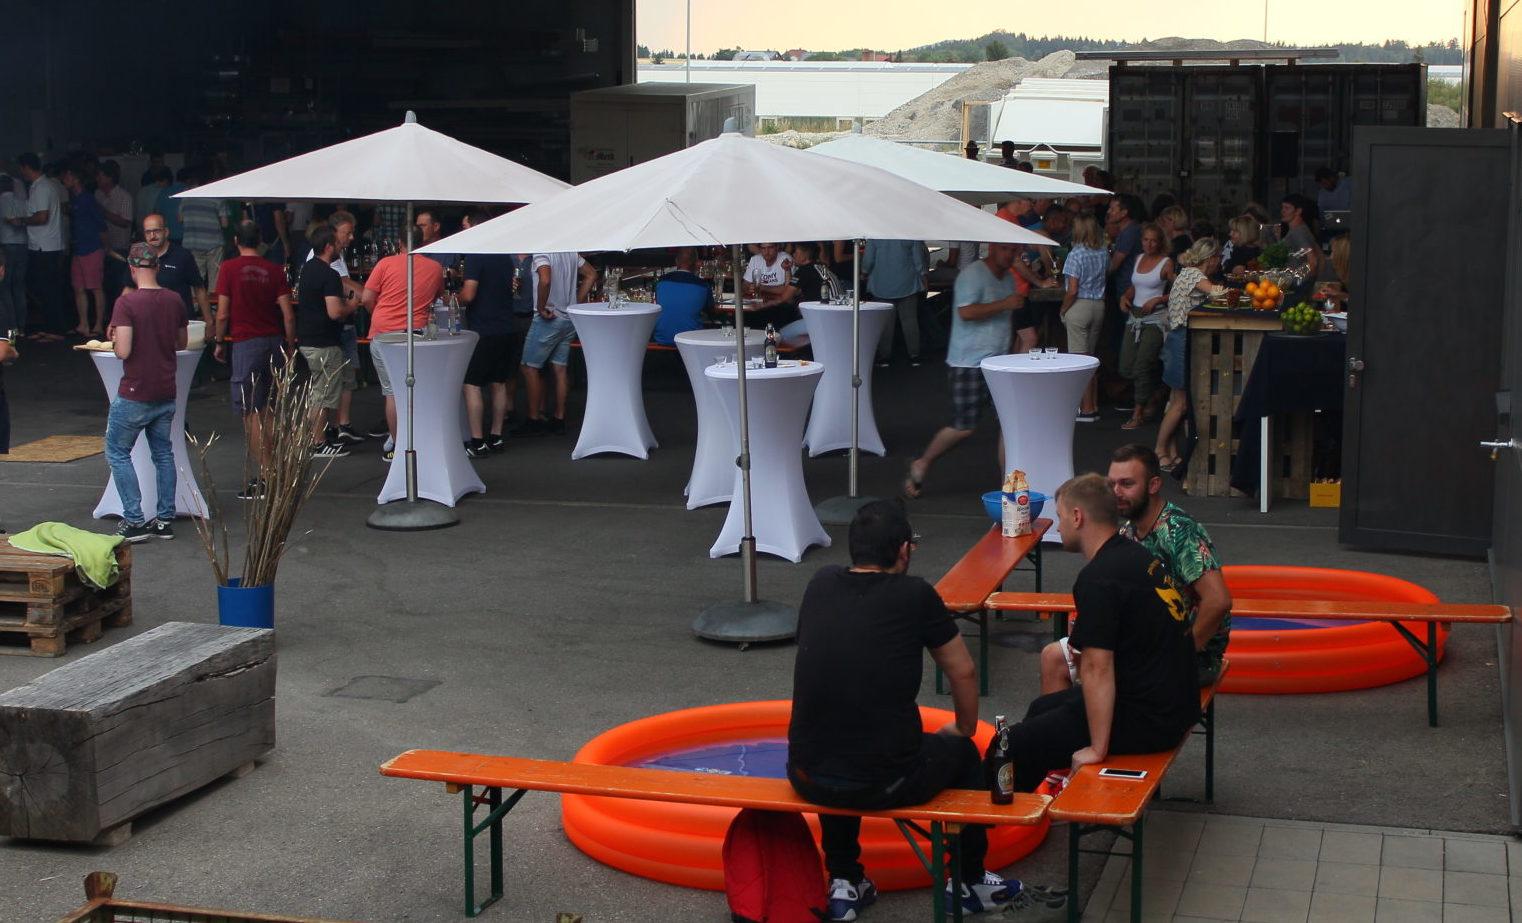 Sommerfest 2019 der Thomas Preuhs Holding GmbH